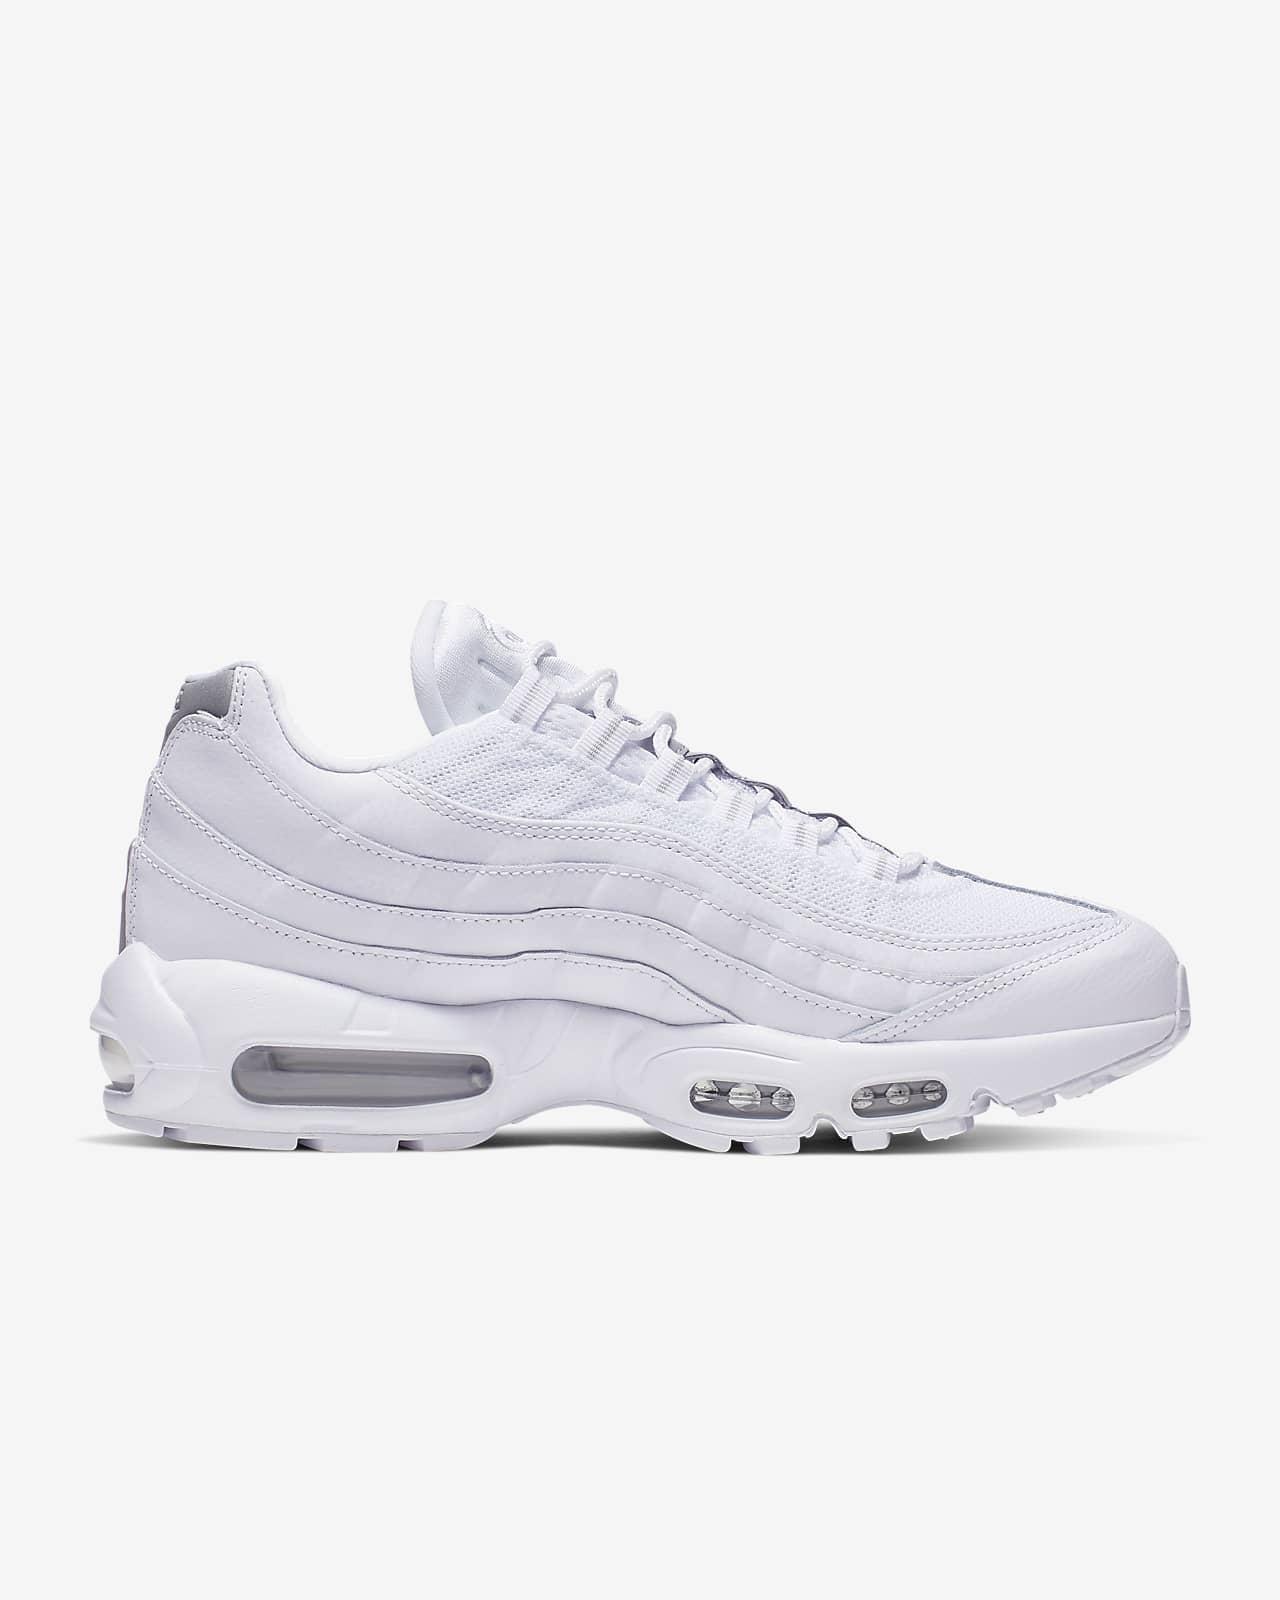 nike air max 95 essential chaussures de running mixte adulte blanc